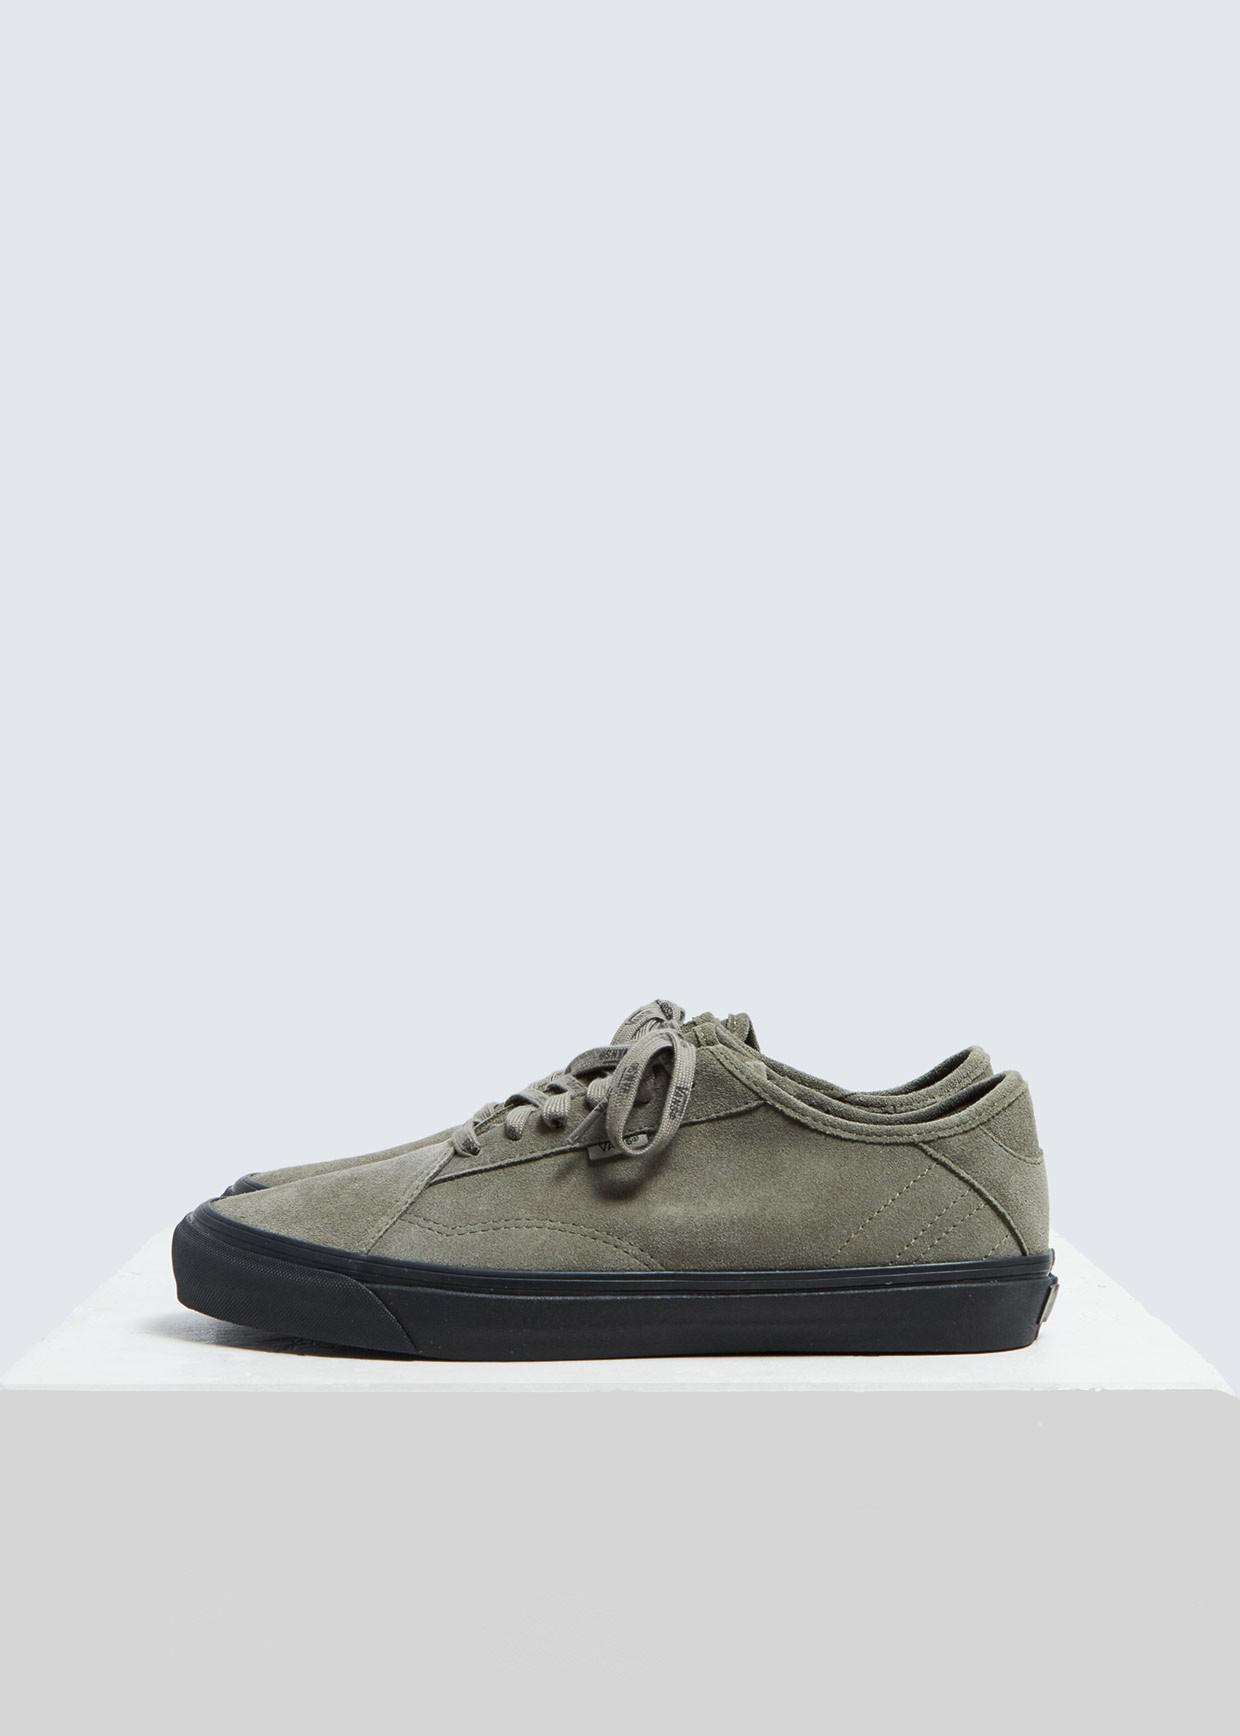 0b0abce8c6 Lyst - Vans Diamo Ni Sneaker in Black for Men